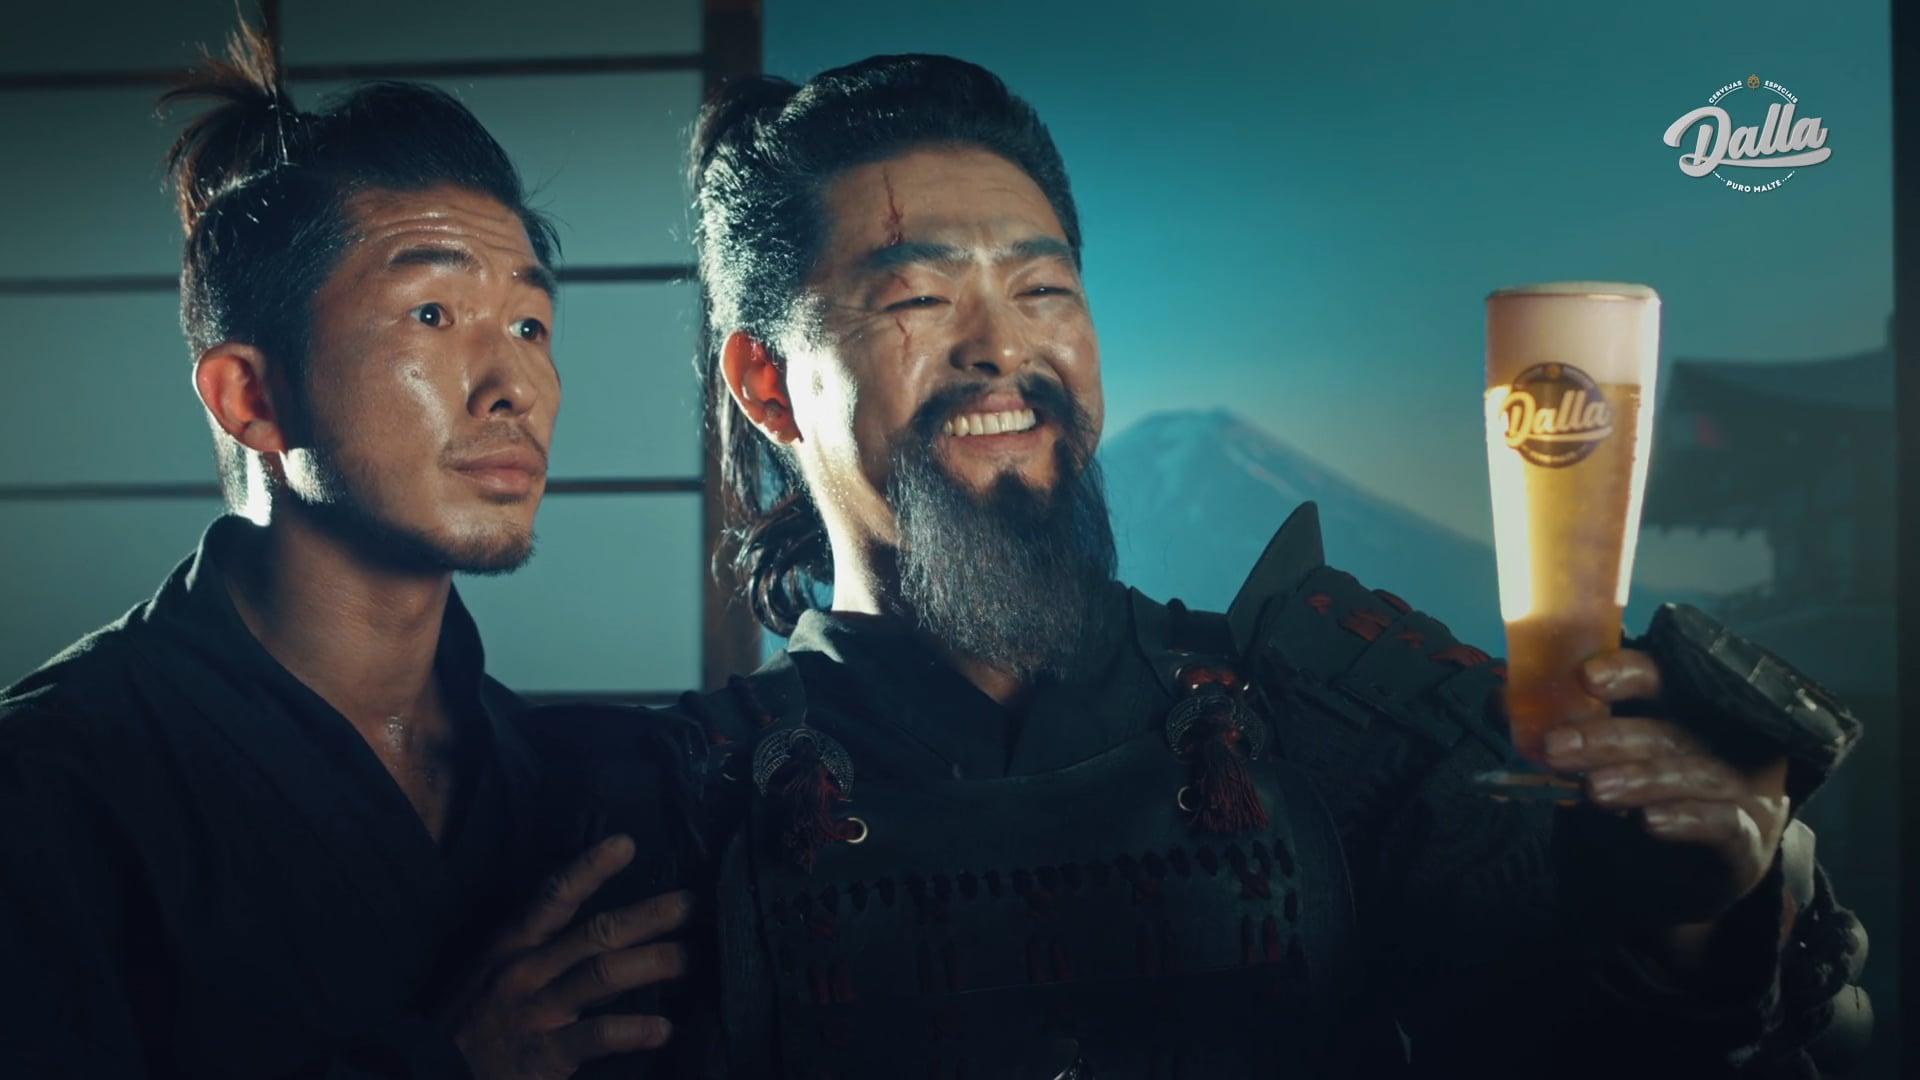 DALLA Cervejaria · Samurai